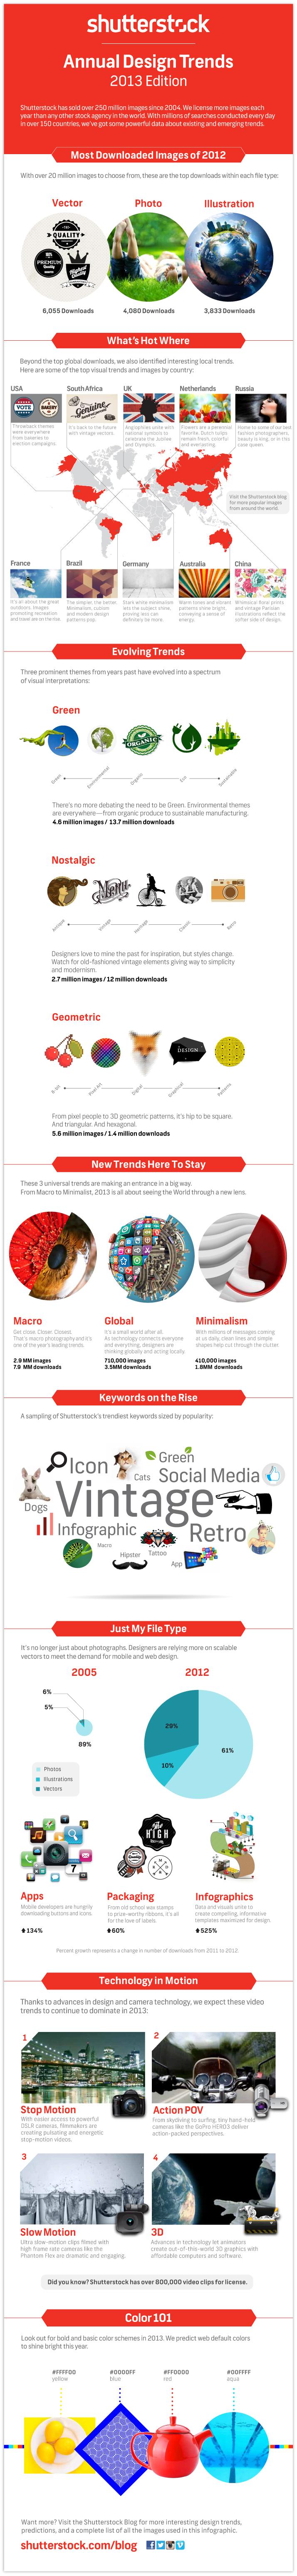 Infographic-Final-English21113_900.jpg